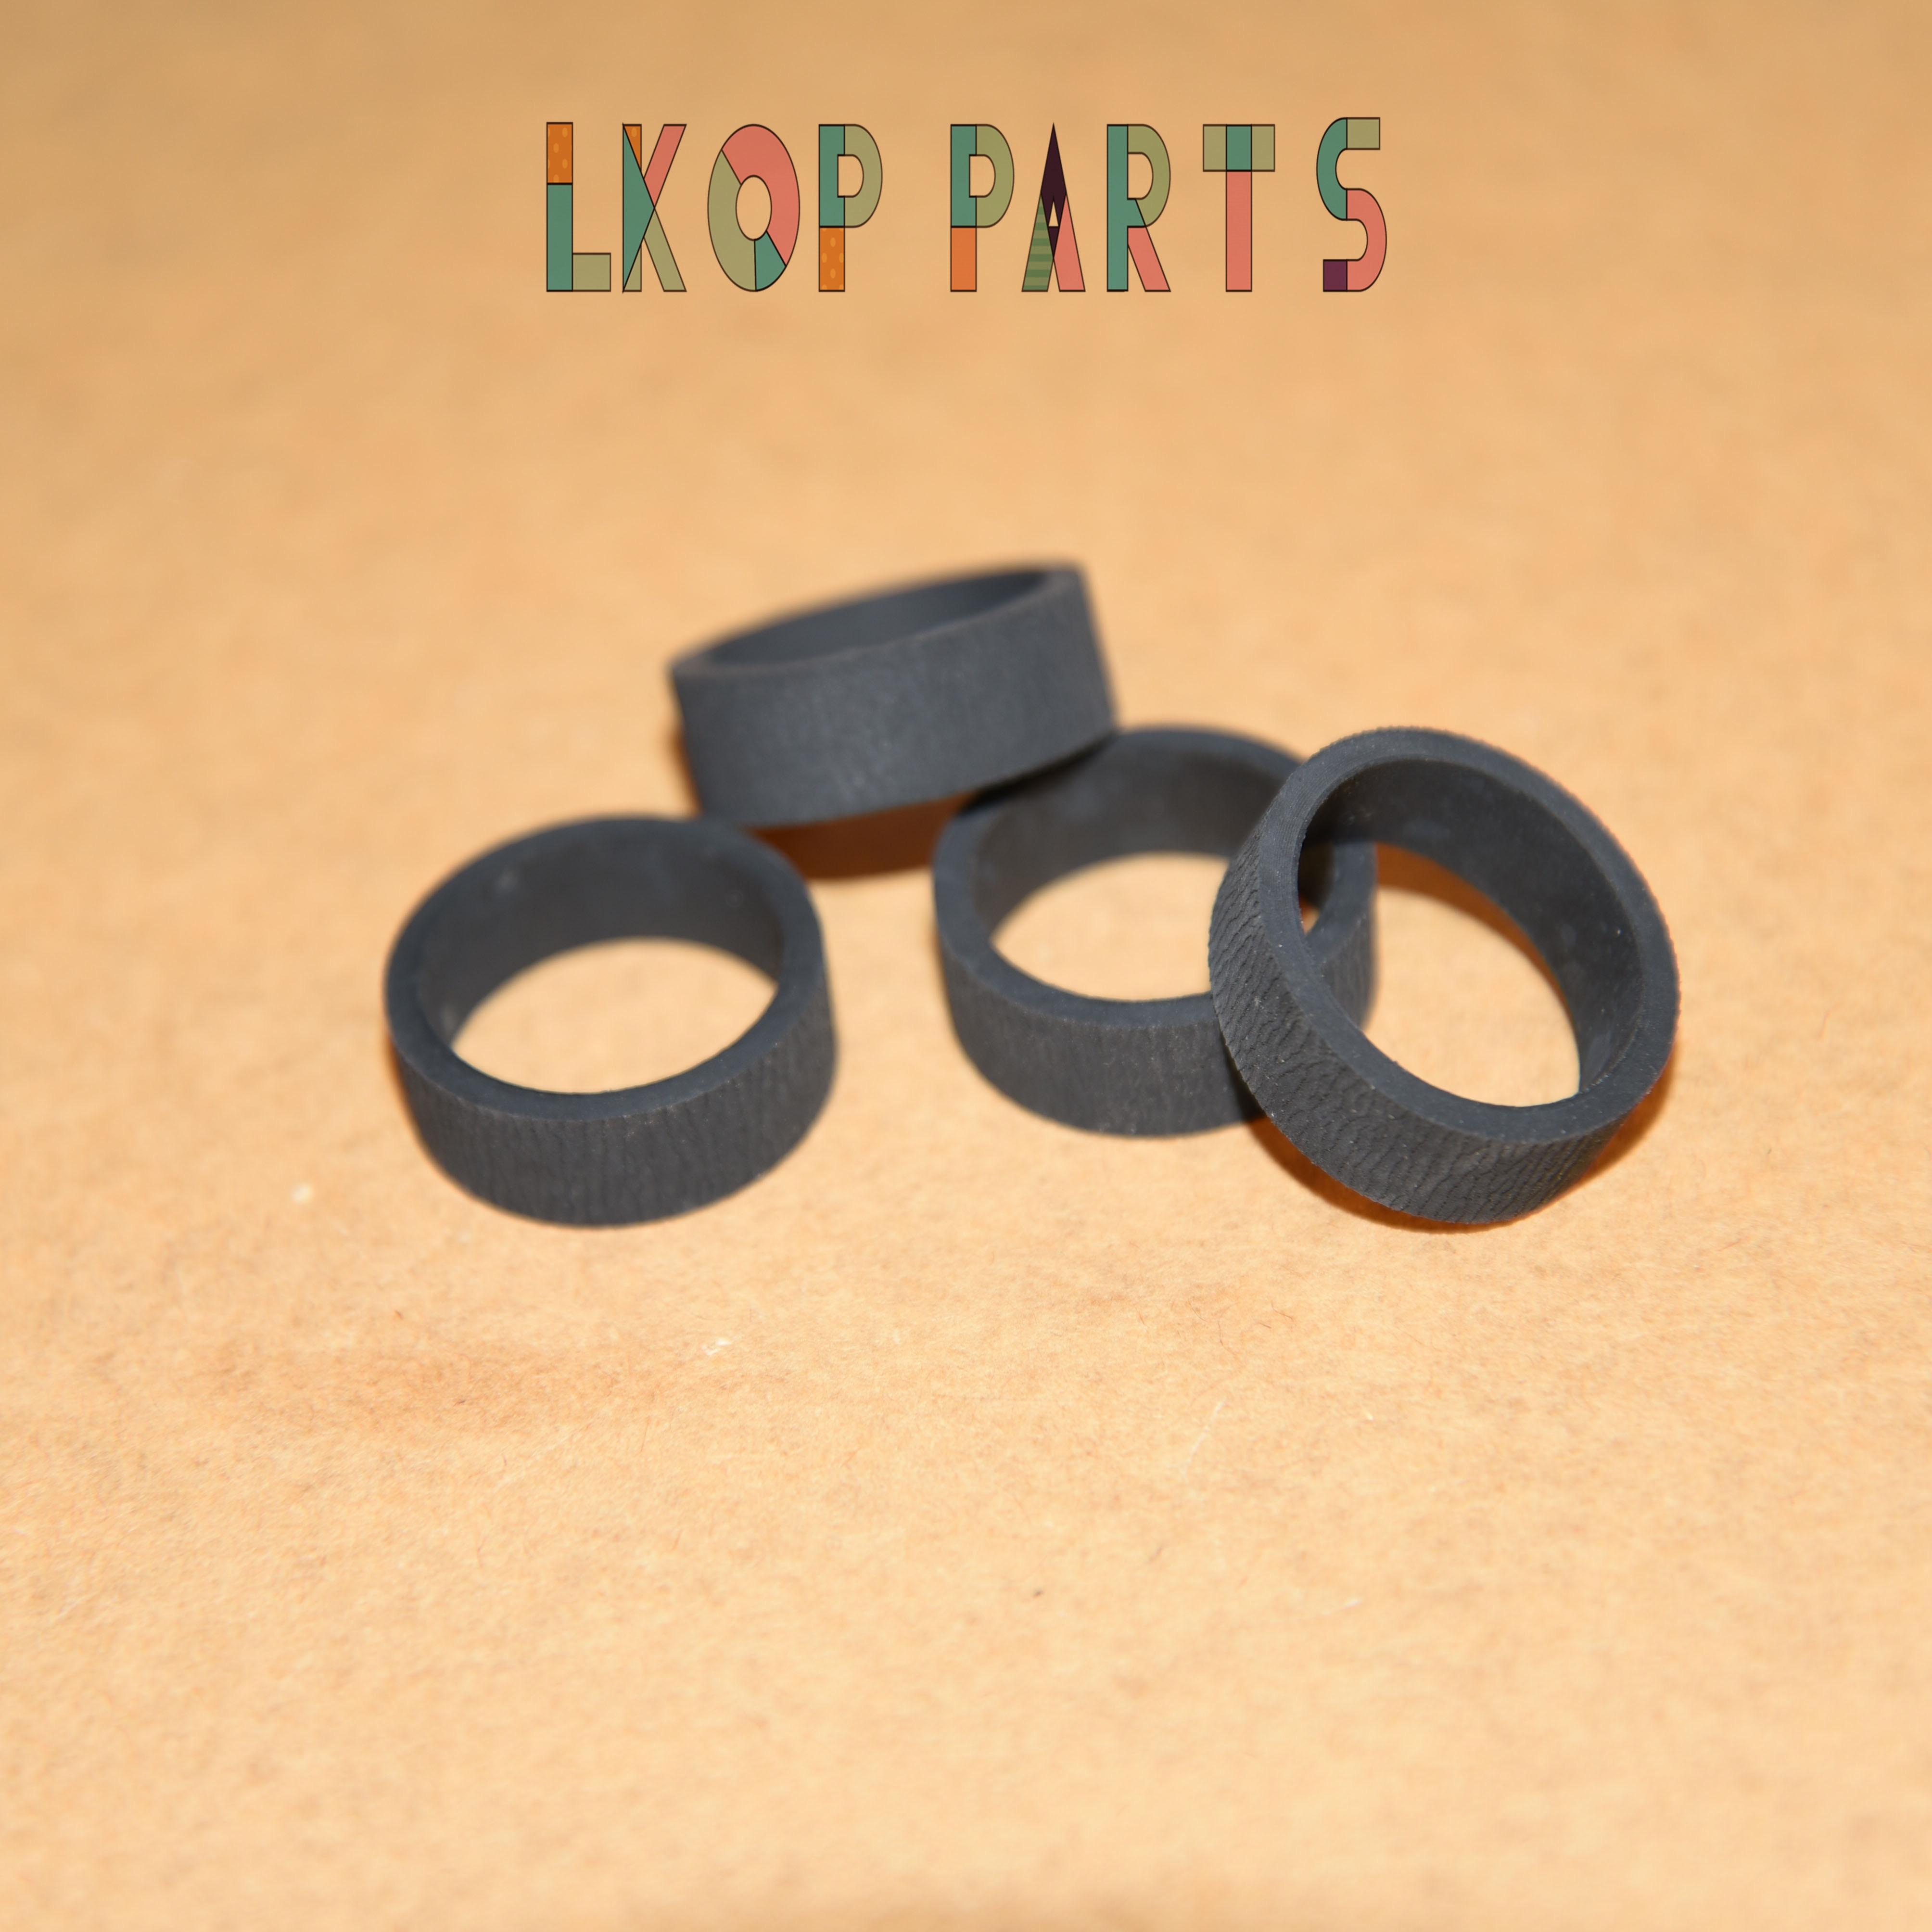 20pcs new Pickup roller tire 56P1820 40X1319 For Lexmark E240 E250 E330 E350 E450 X203 X204 For DELL1700 1710 1720 long life